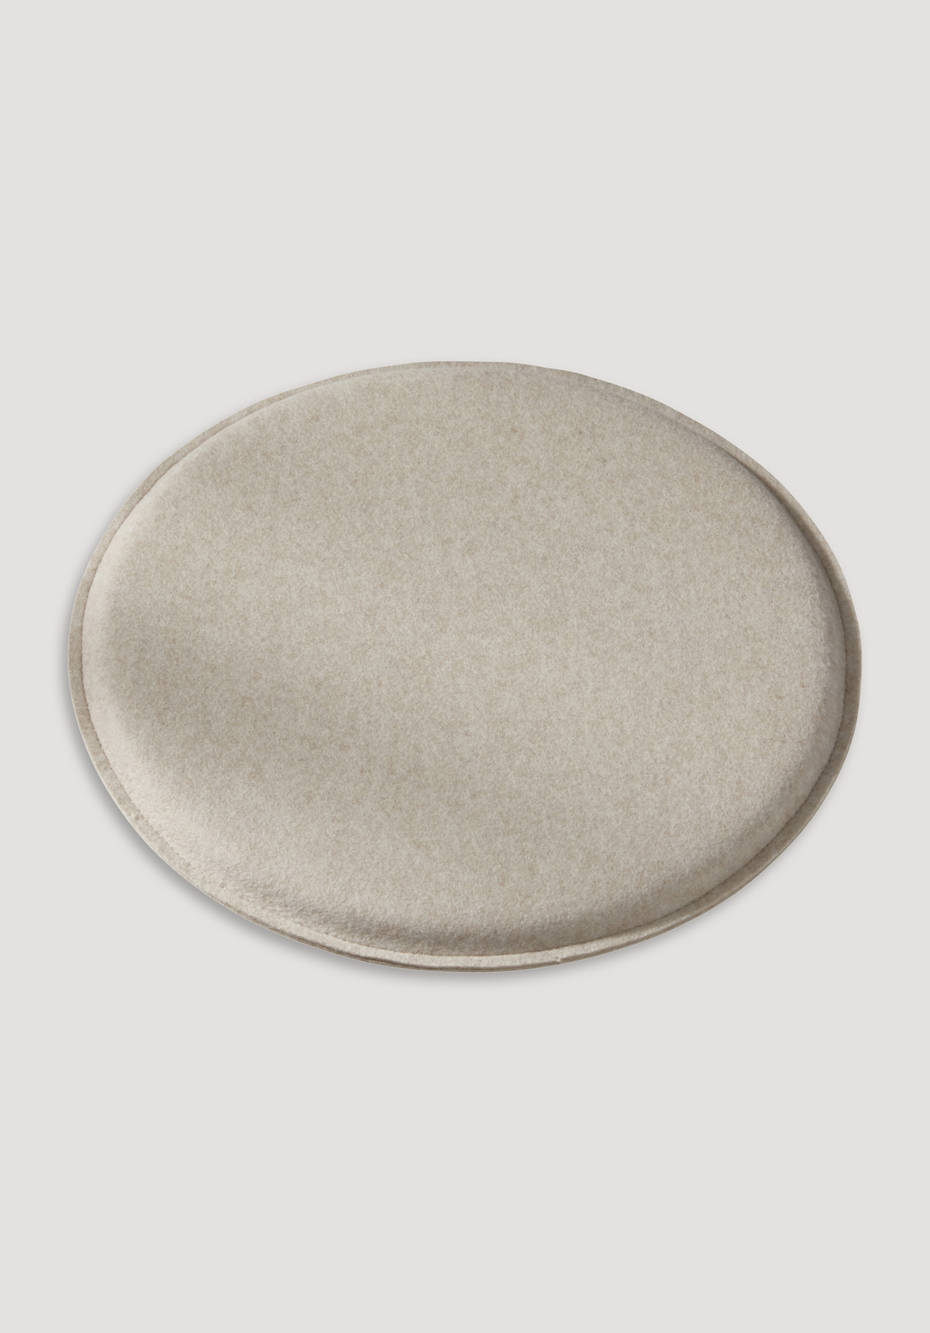 Round felt cushions made of virgin wool